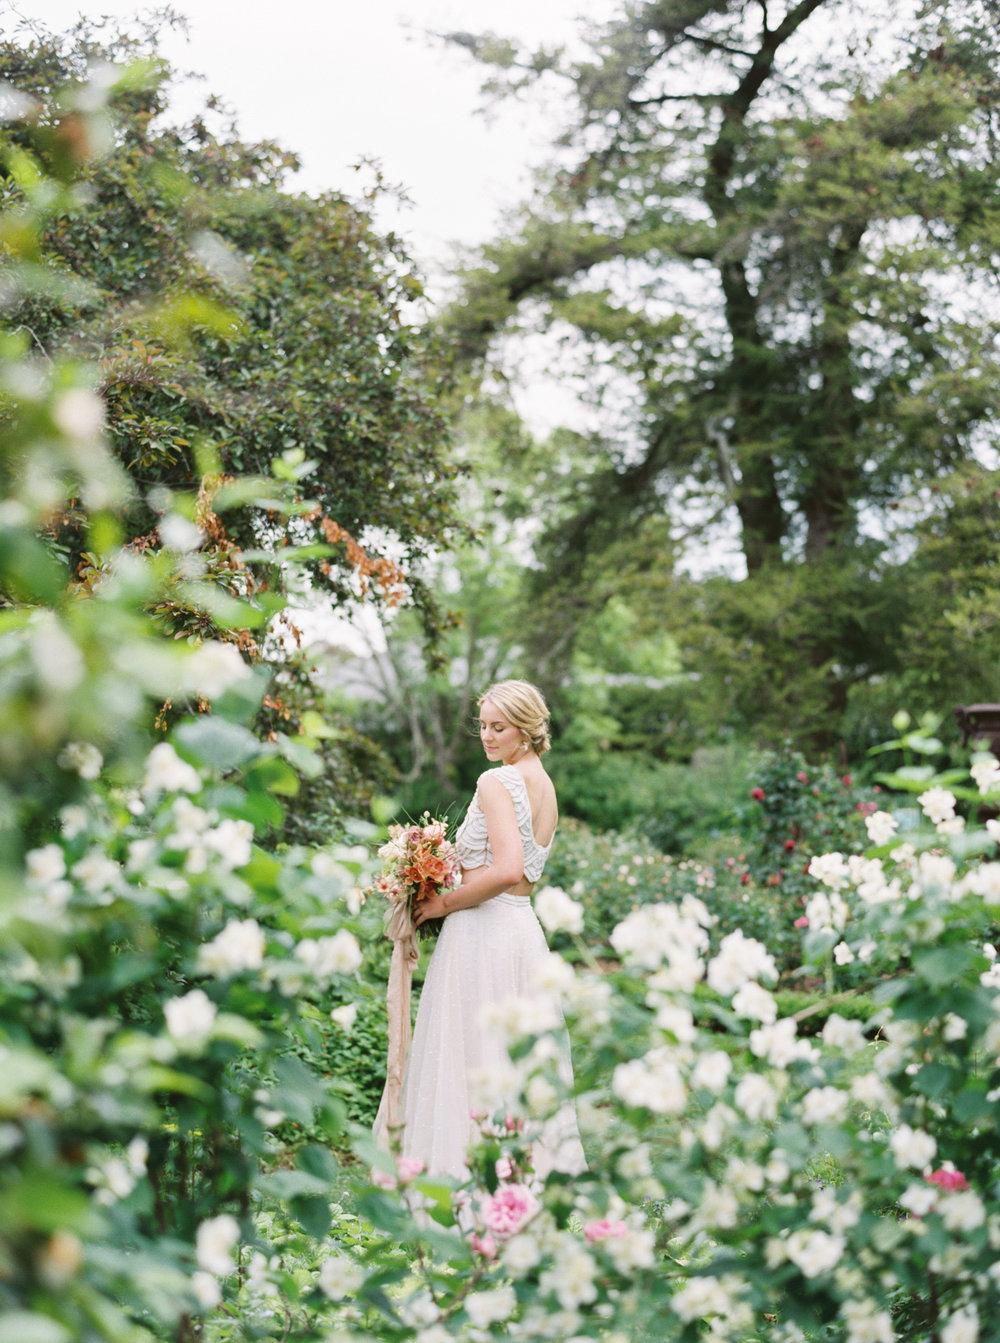 Timeless Southern Highland Wedding Elopement in Bowral NSW Fine Art Film Photographer Sheri McMahon-28.jpg